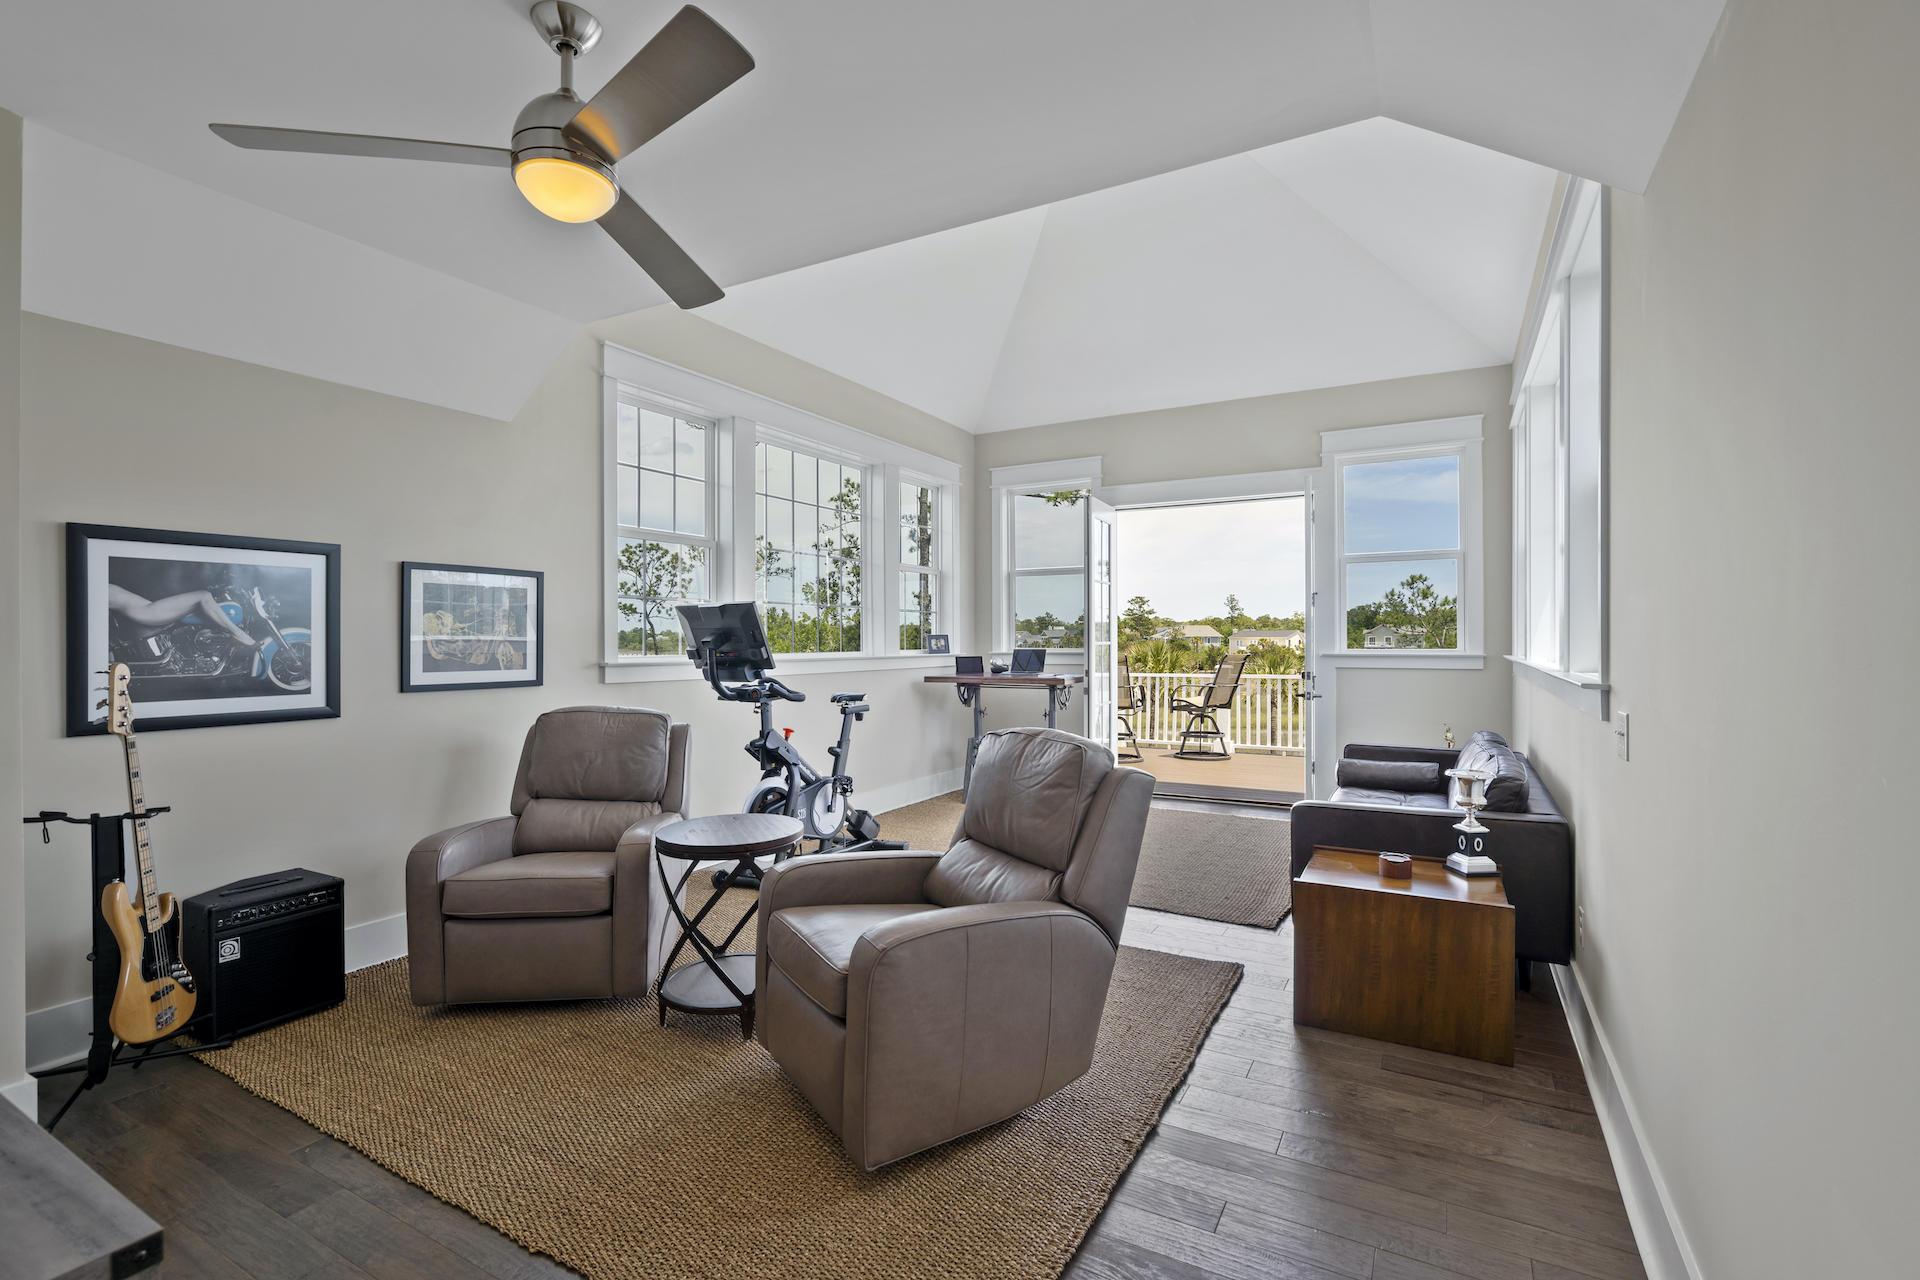 Dunes West Homes For Sale - 2316 Bucktail, Mount Pleasant, SC - 25